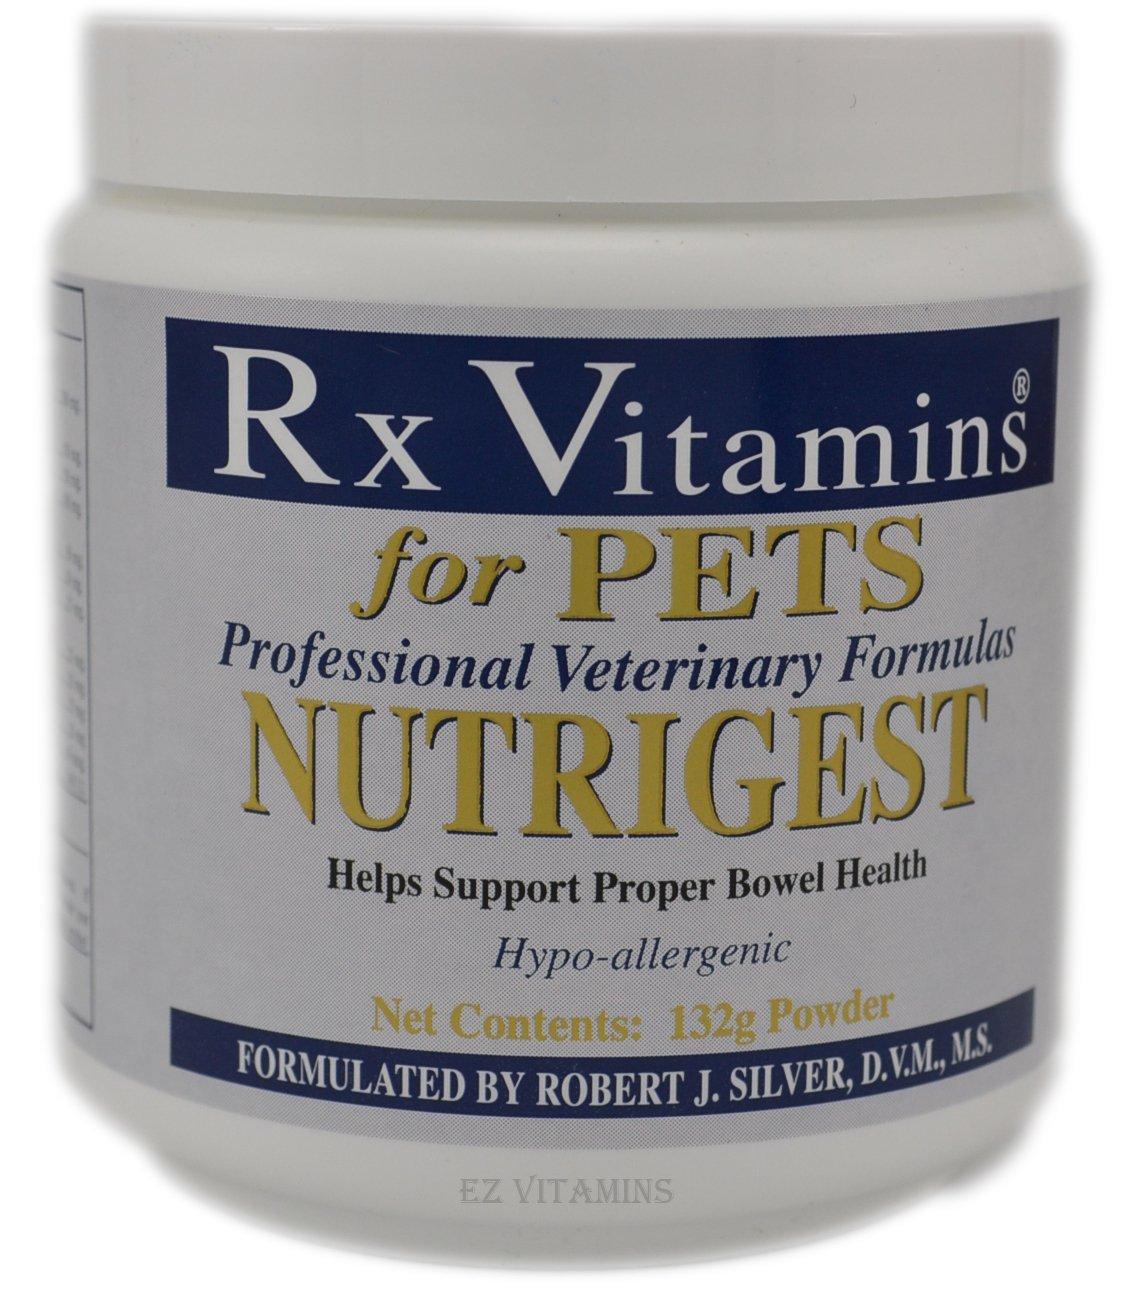 pet vitamins